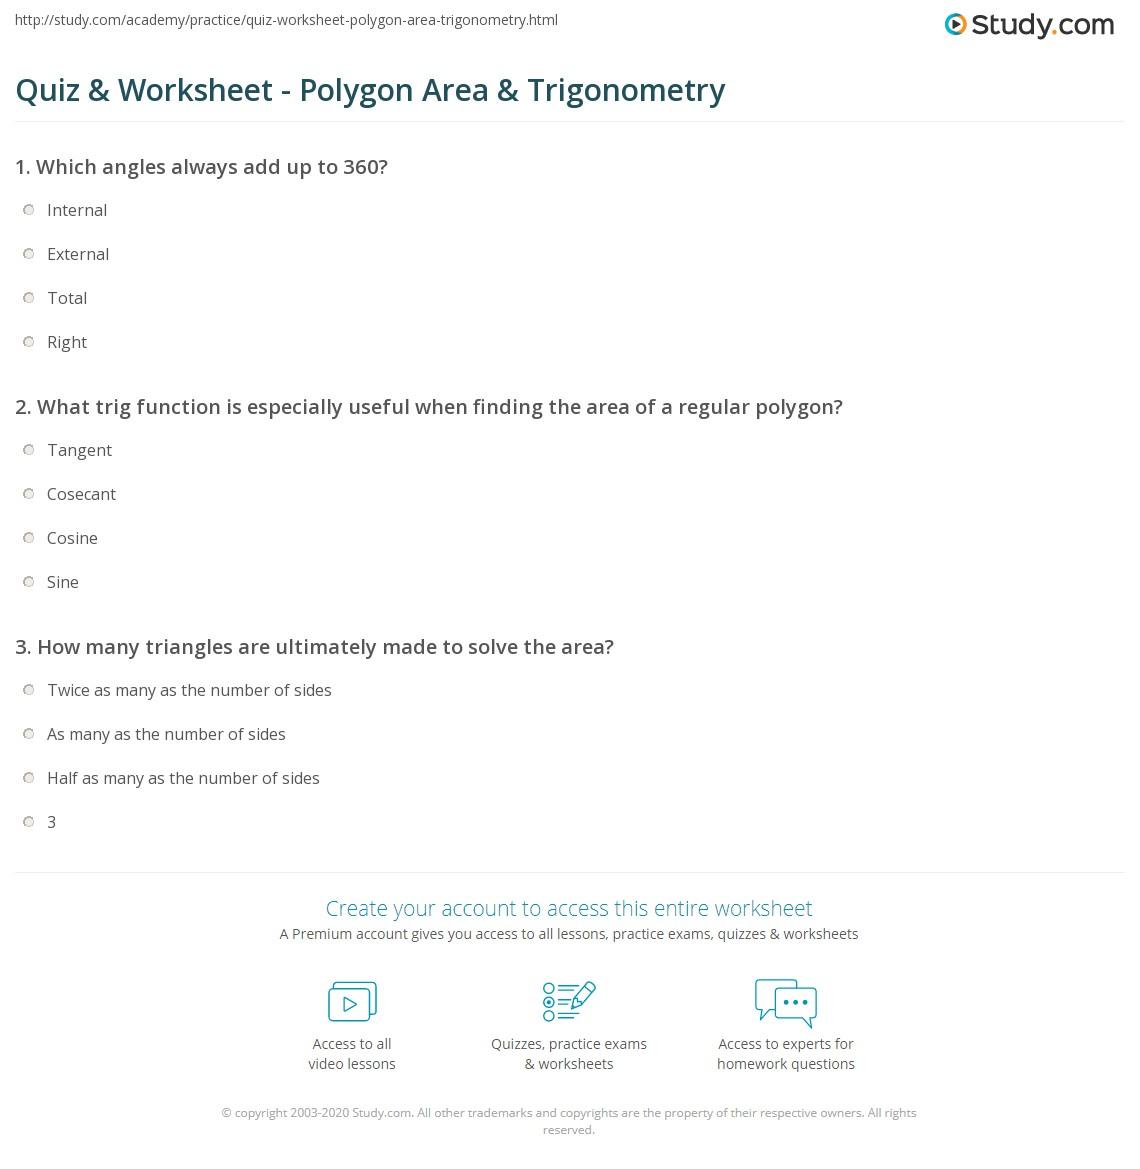 Quiz W Ksheet Polyg Re Trig Ometry Study